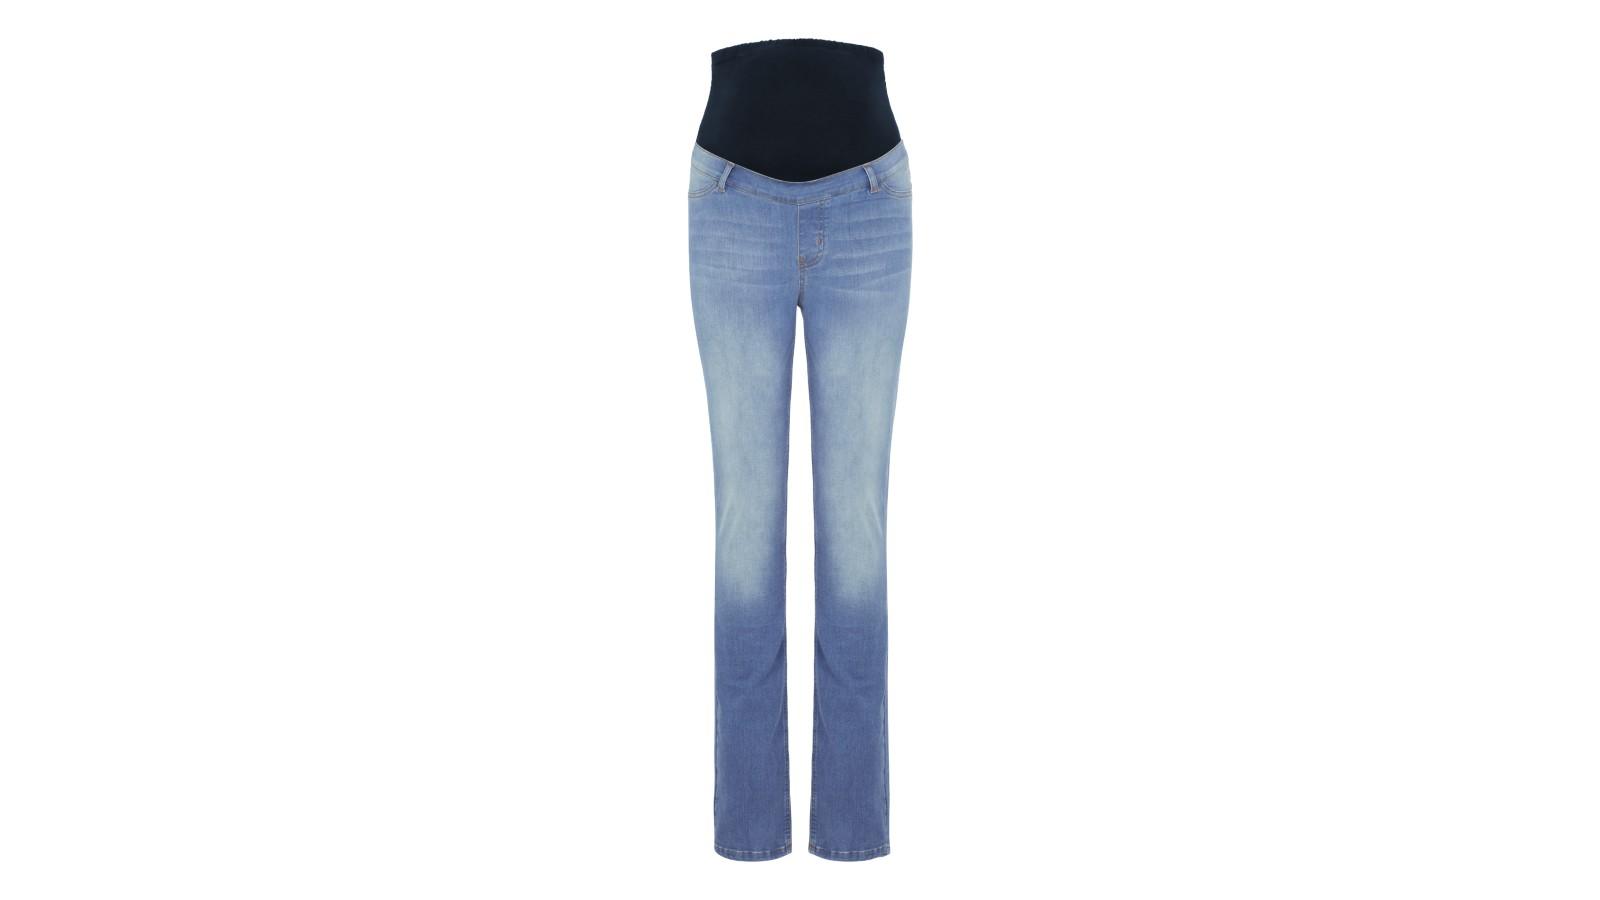 Jeans de maternité à jambe étroite Long Tall Sally